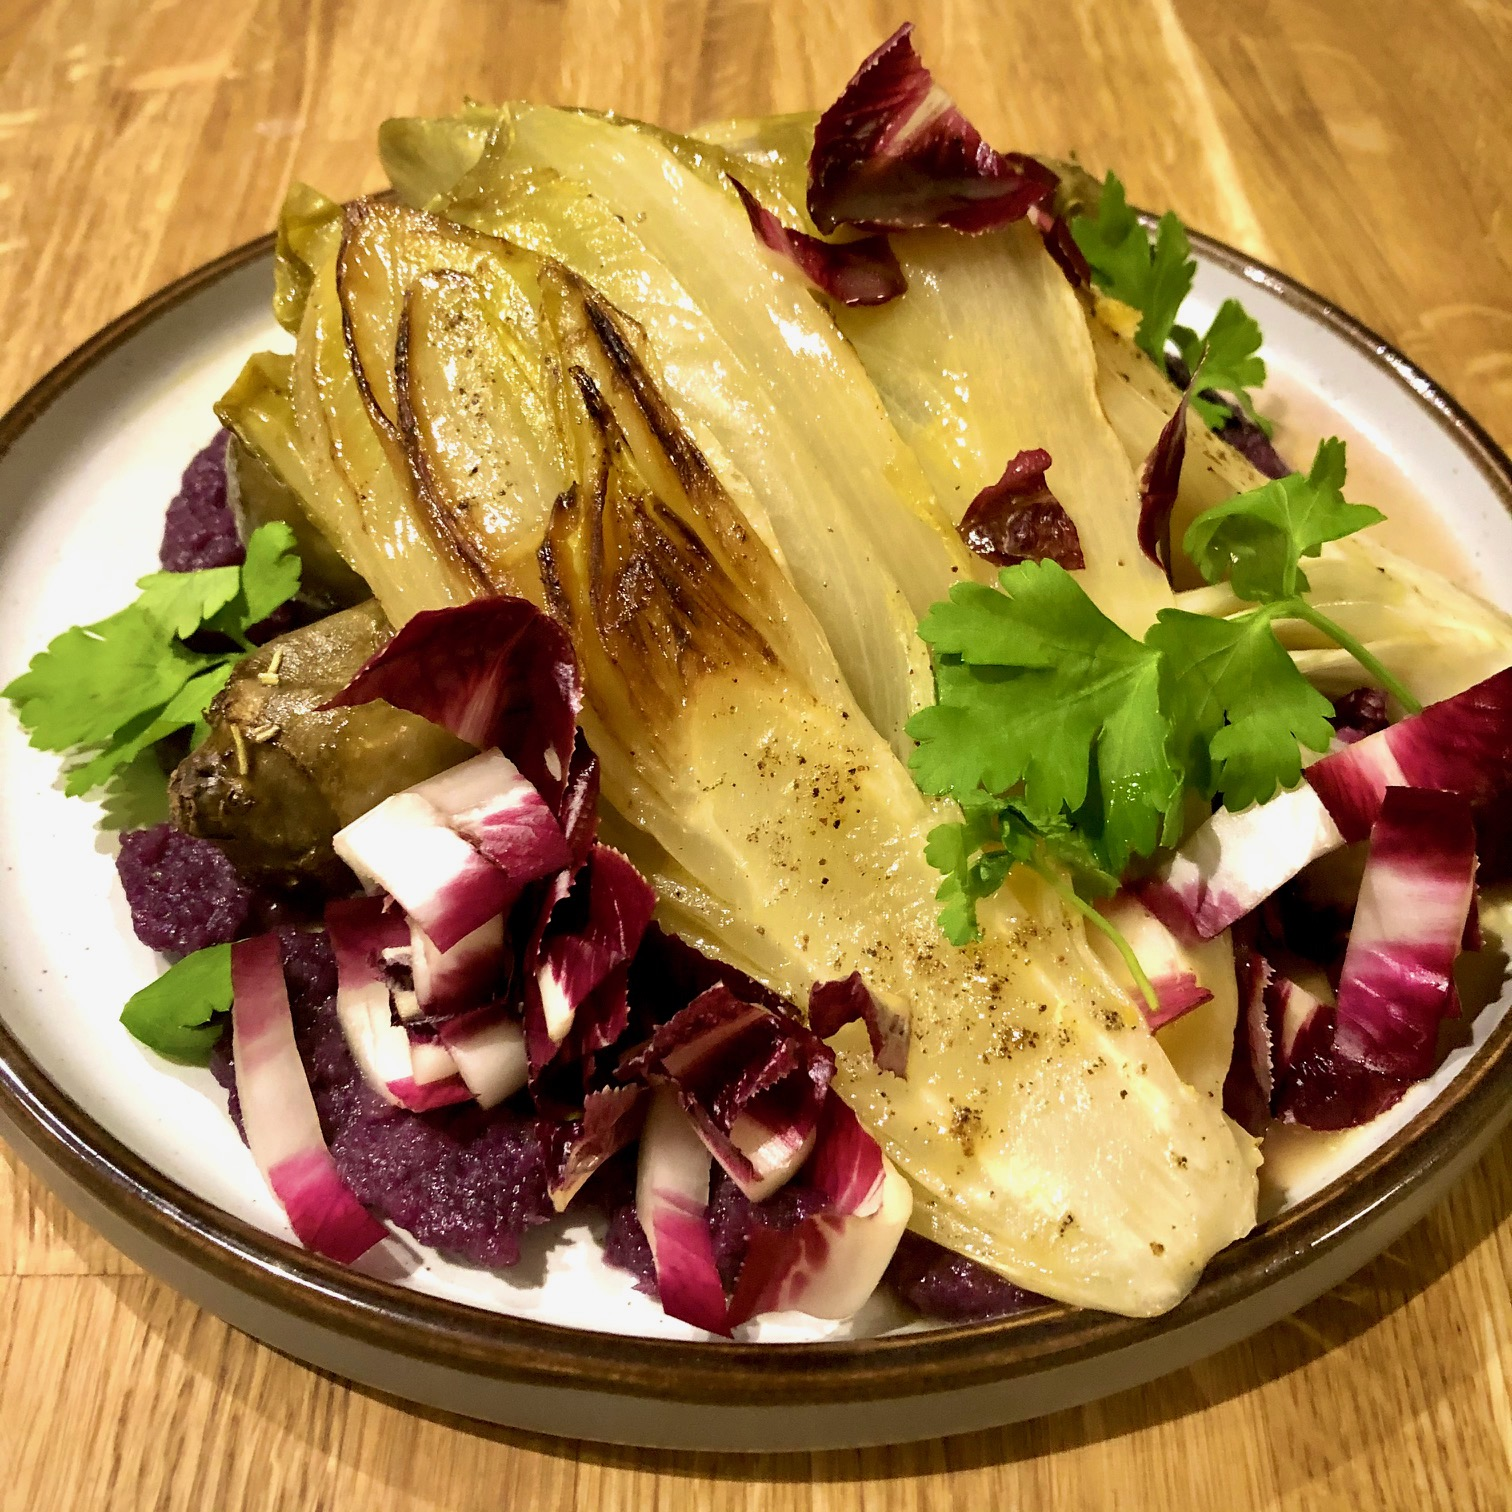 Jerusalem Artichoke, Braised Red Cabbage Puree, Orange Glazed Chicory